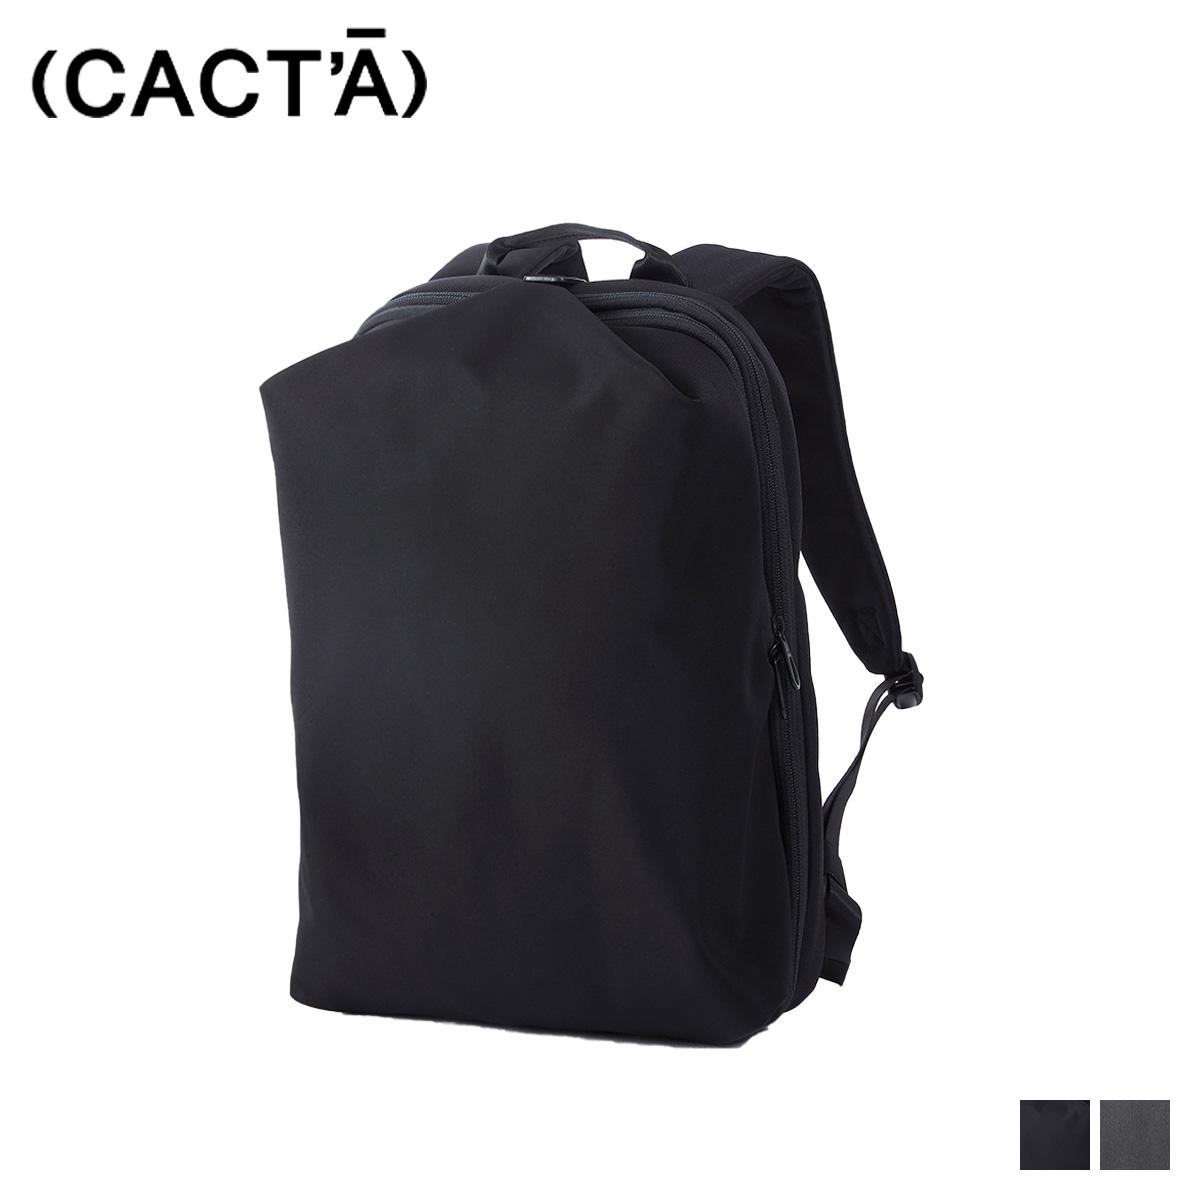 CACTA COLON TRAVELERS BACKPACK 1 カクタ リュック バッグ バックパック メンズ レディース ブラック グレー 黒 1001